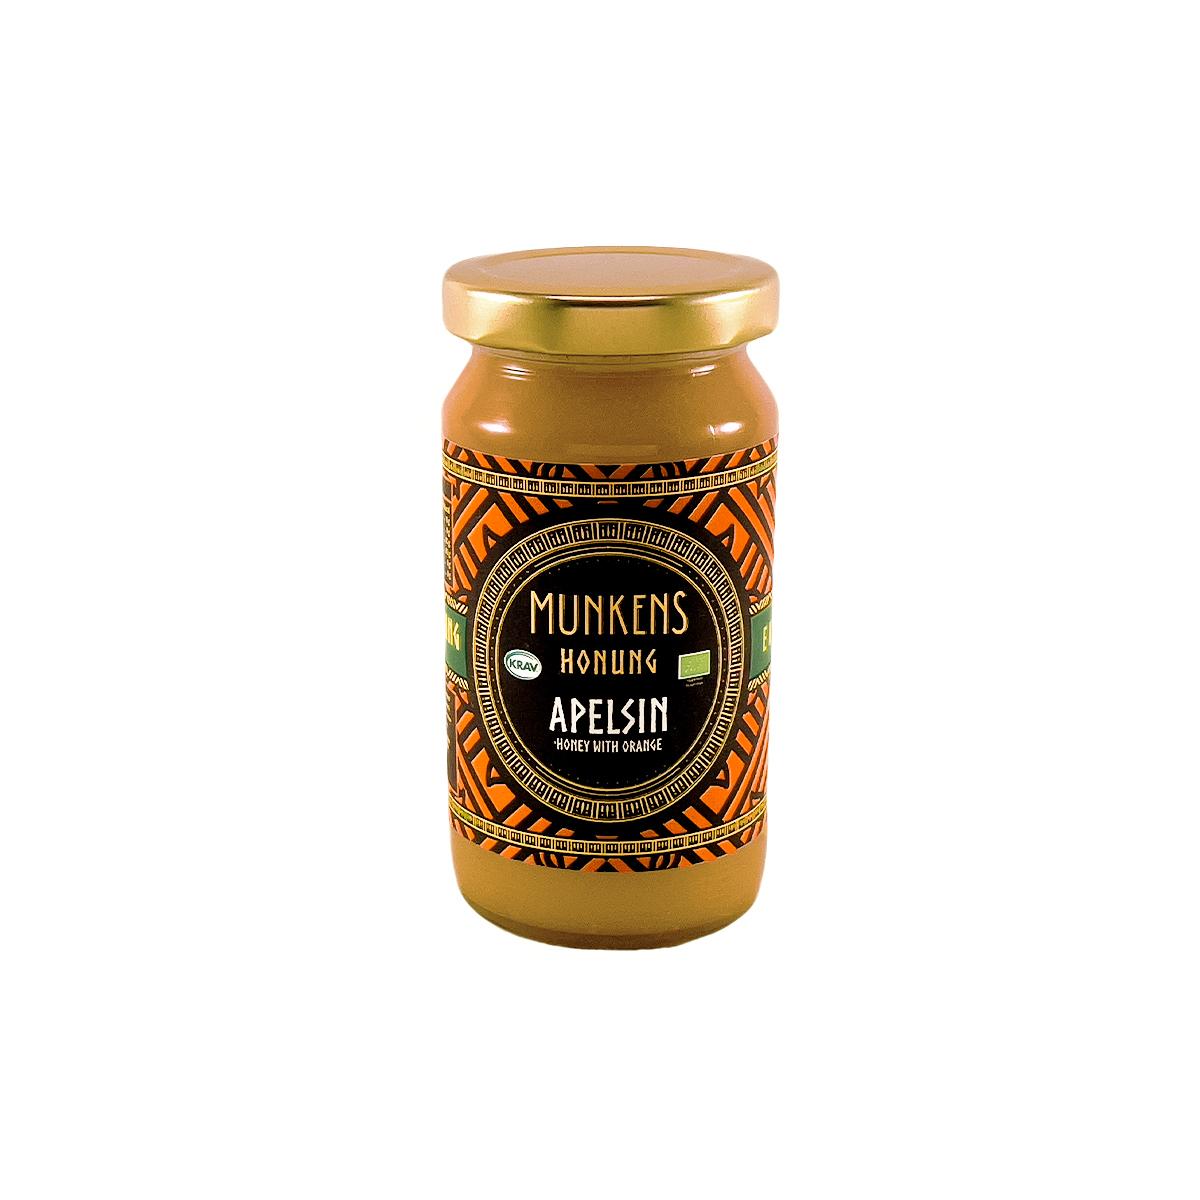 Munkens Honung – Kallrörd:Rå:Raw – Apelsin 280g